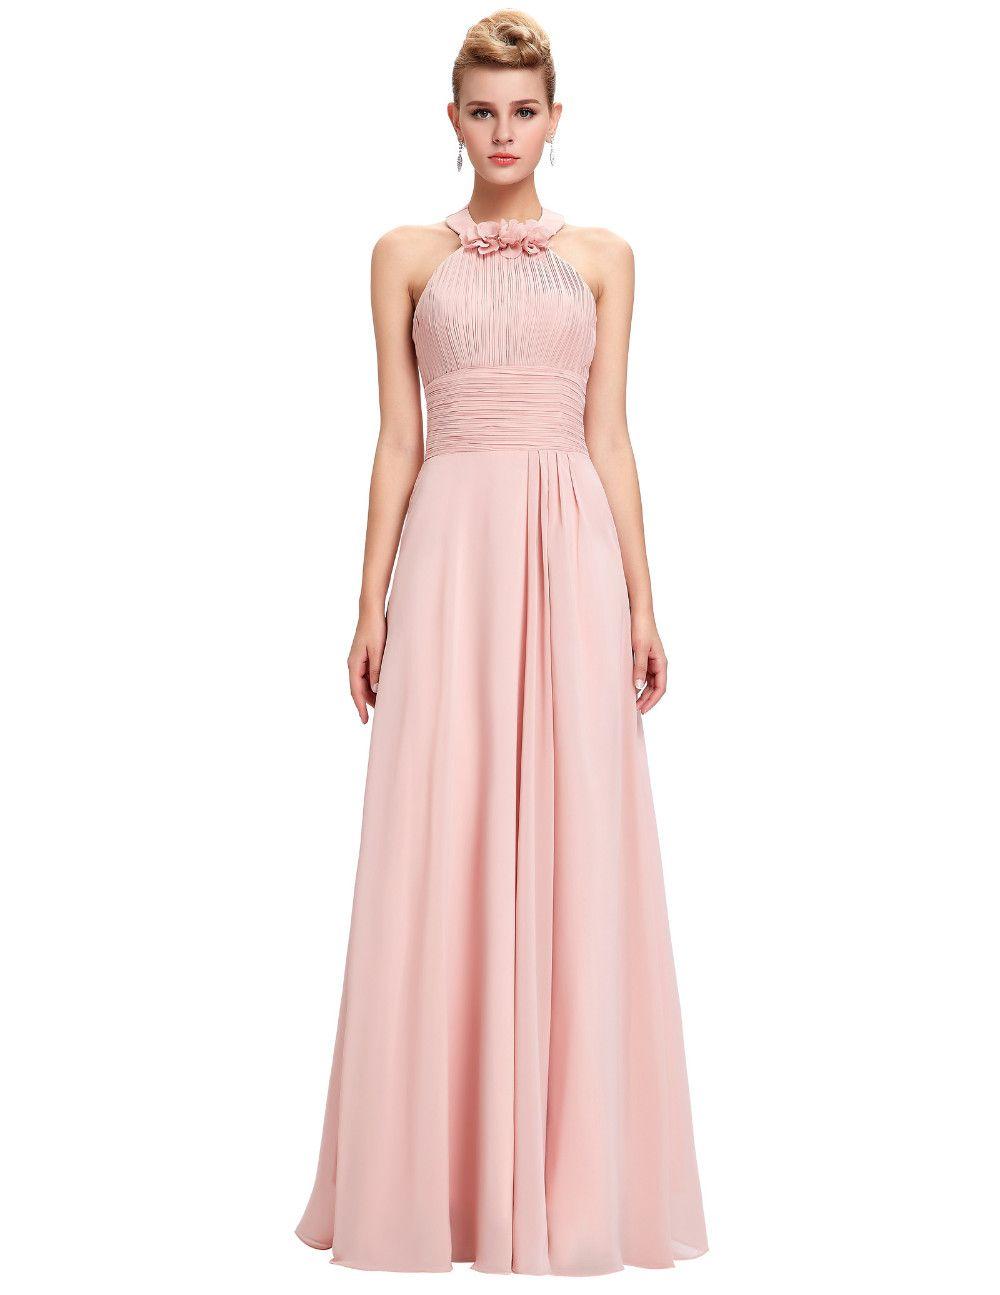 free shippingBackless Prom Dress Long 2016 Halter Pleated Waist ...